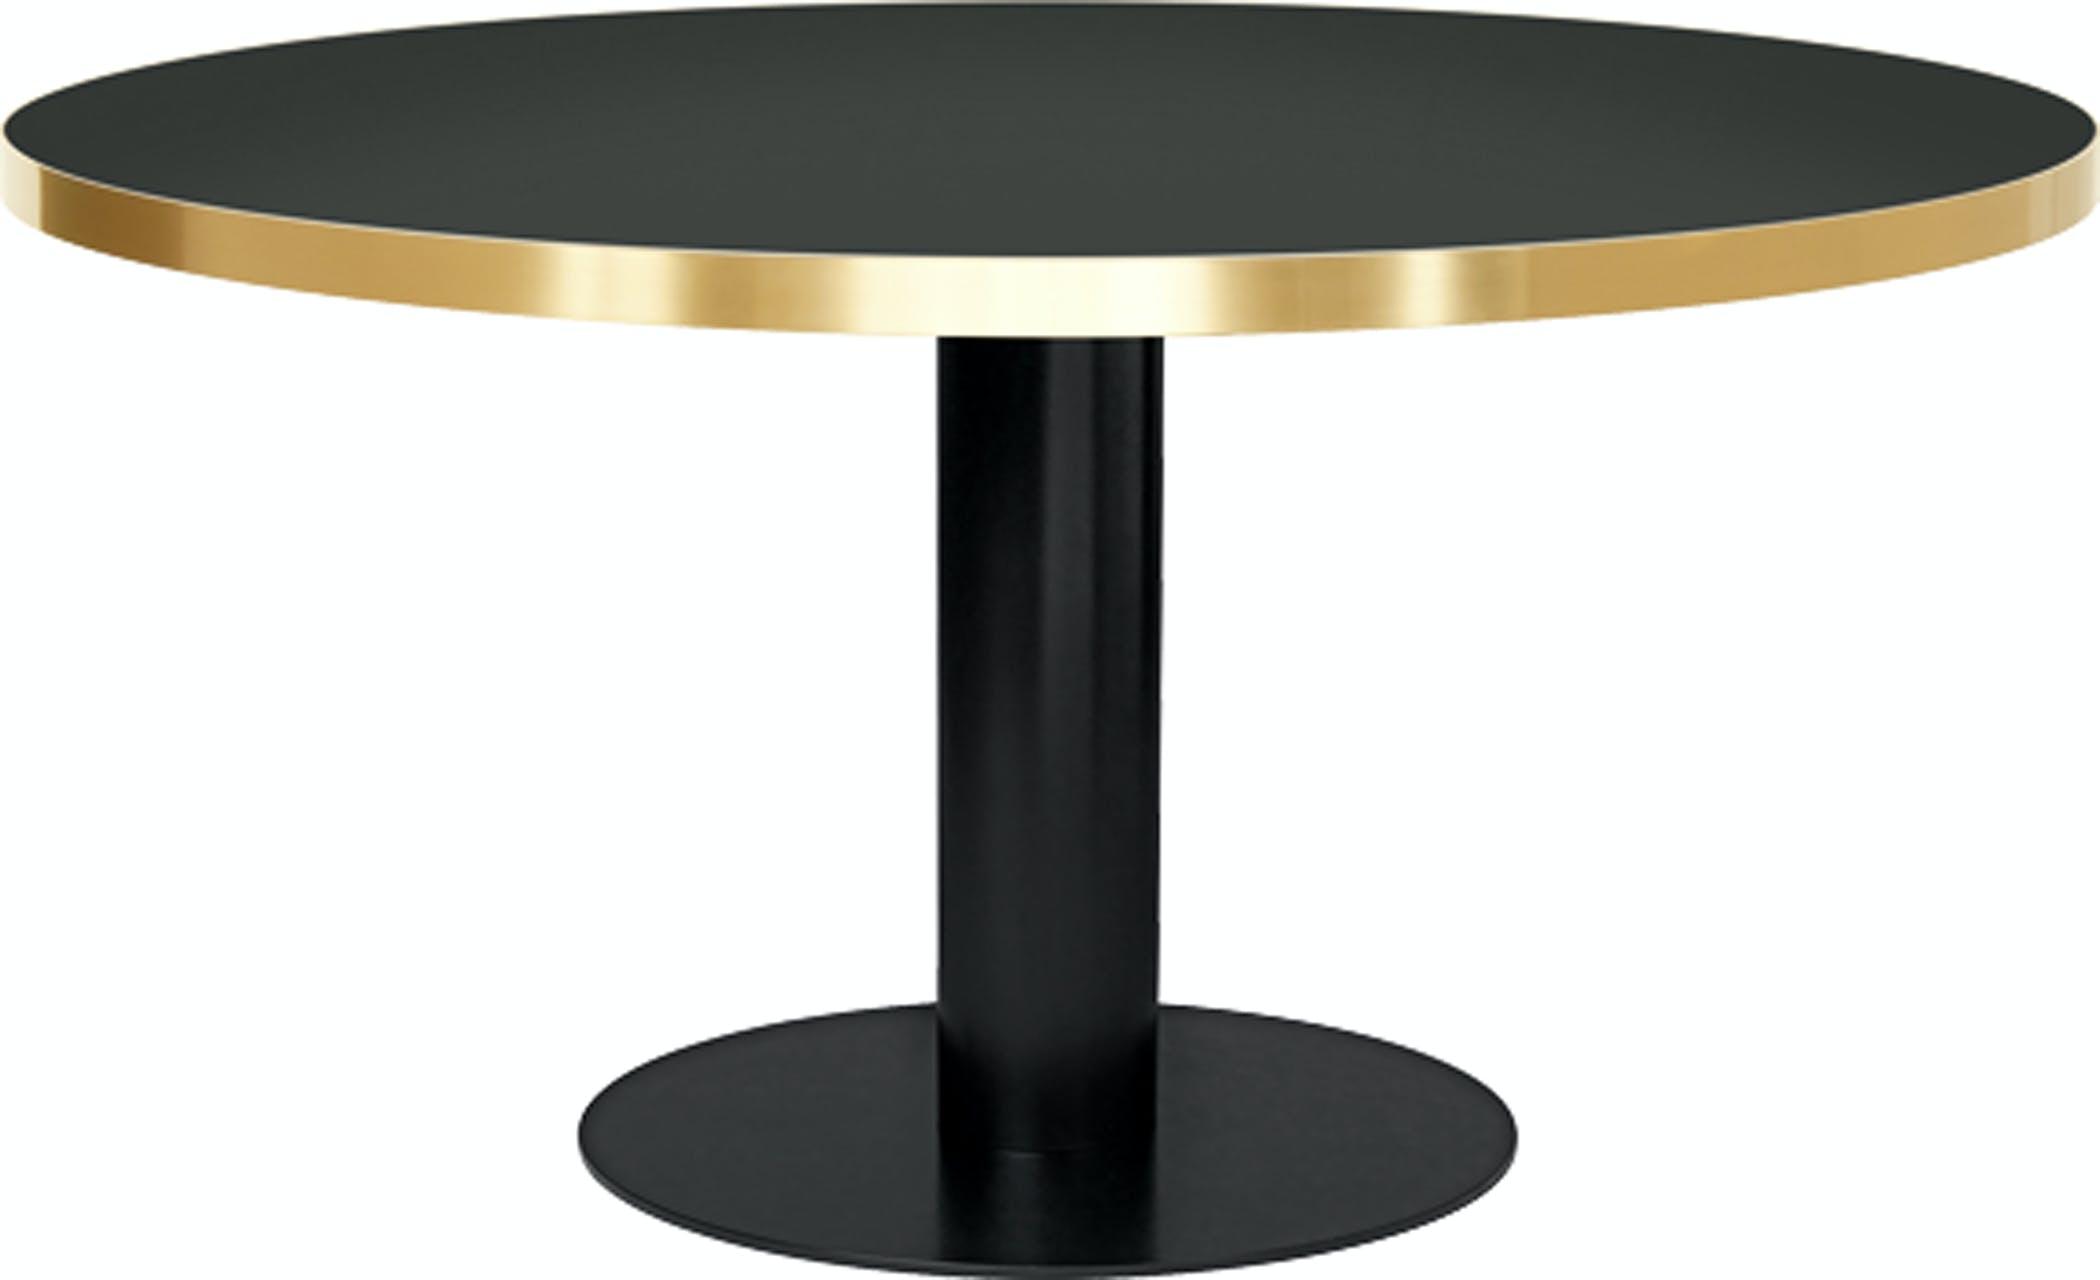 Gubi2 0 Diningtable Round Glass Size Black Granitegrey Temp Image